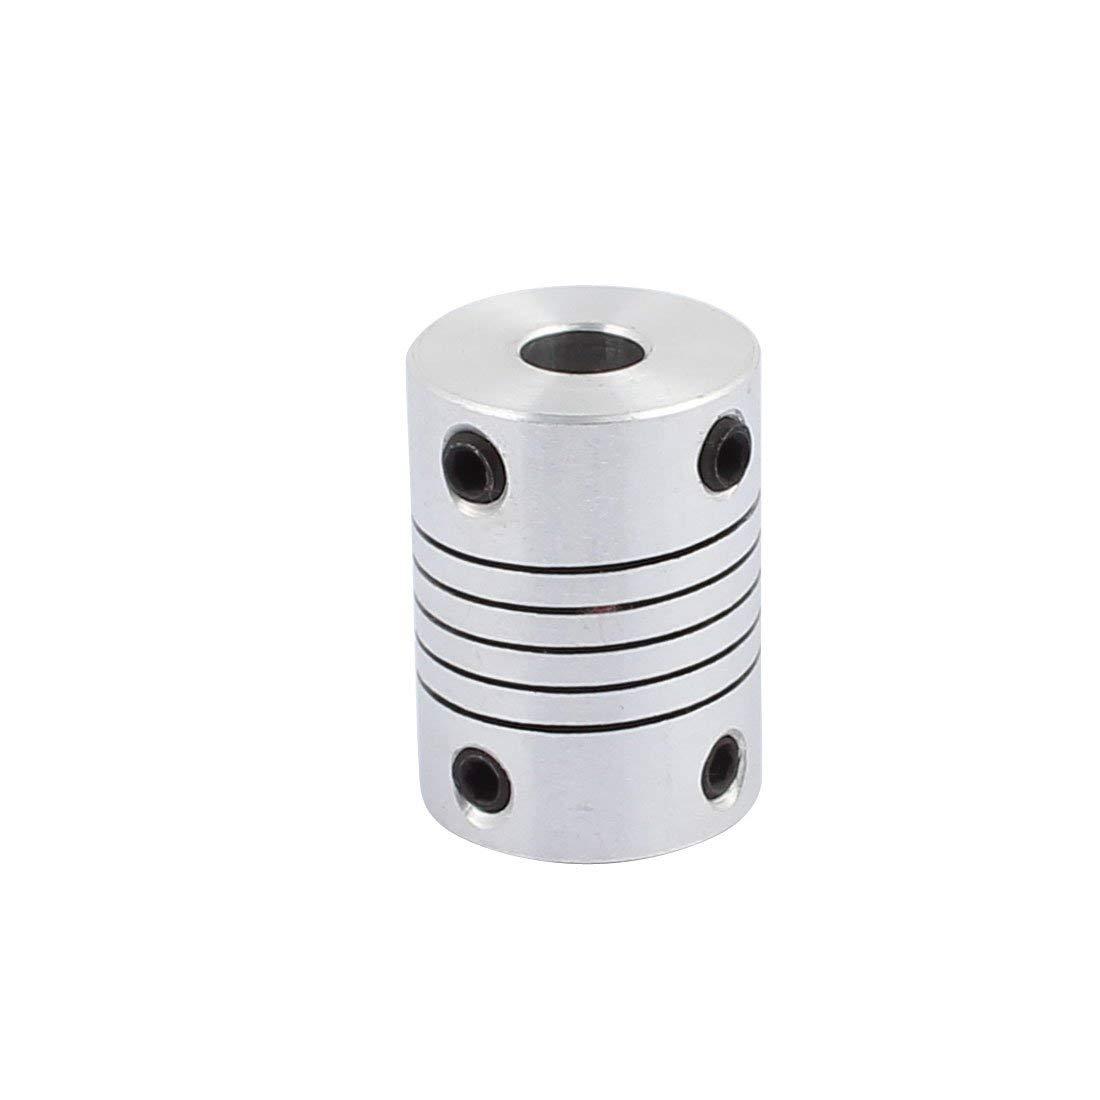 6.35mm to 6.35mm Shaft Coupling 25mm Length 18mm Diameter Stepper Motor Coupler Aluminum Alloy Connector for 3D Printer CNC Machine DIY Encoder